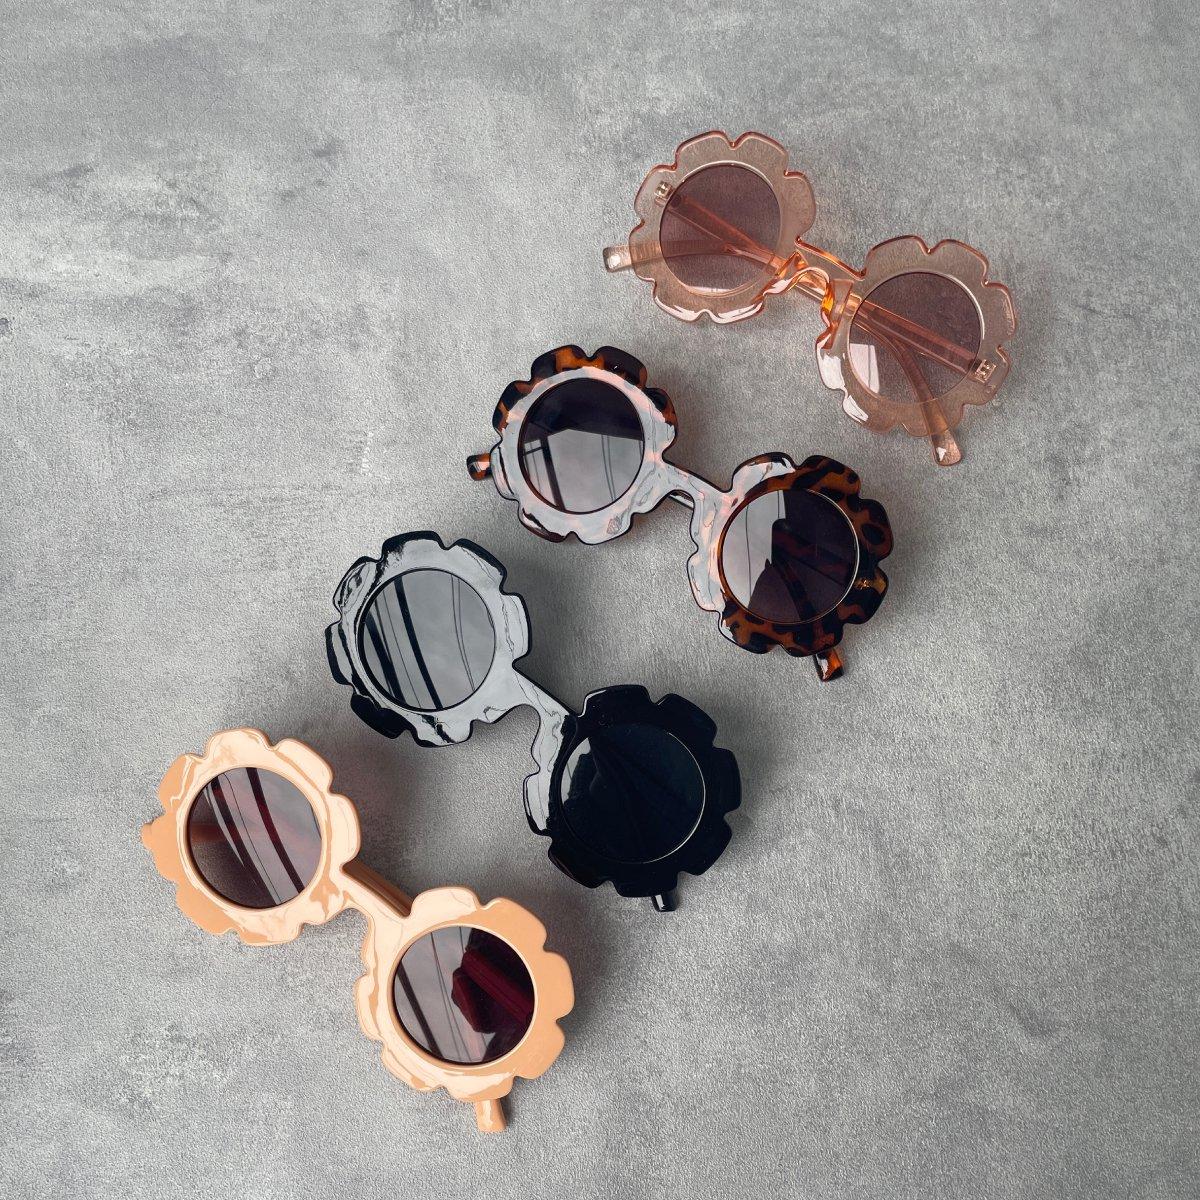 【KIDS】Kids Flower Sunglasses 詳細画像5